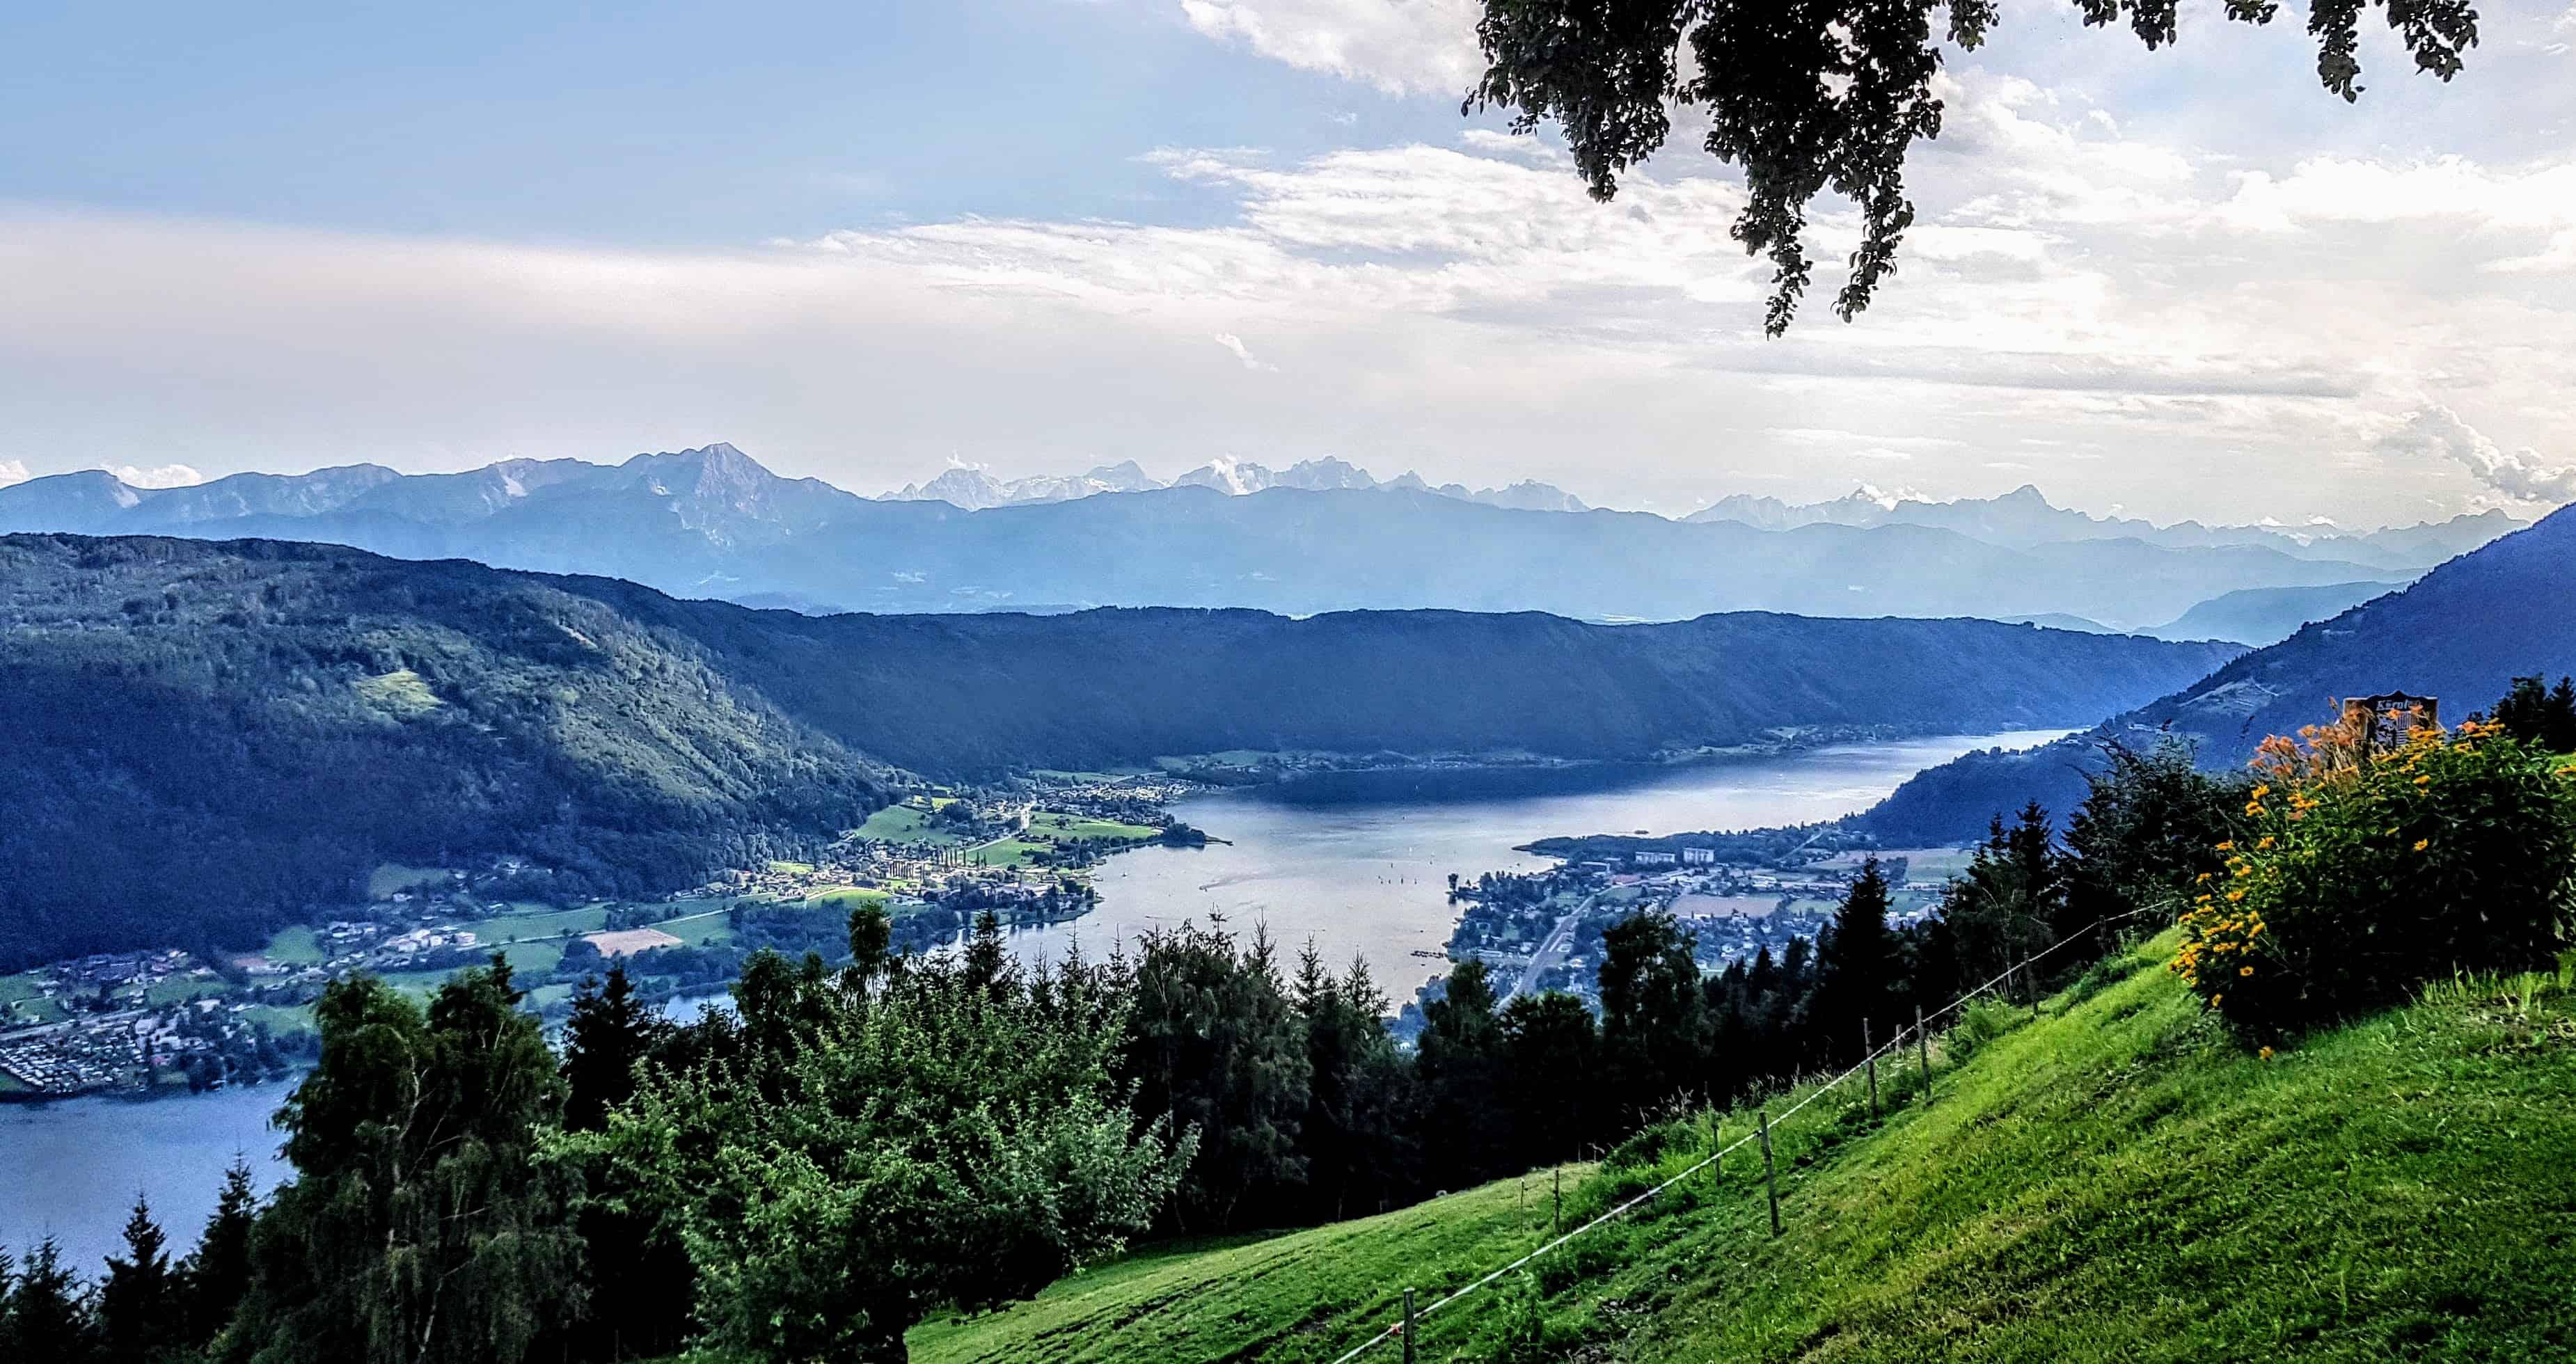 Blick auf Ossiacher See Richtung Villach mit Karawanken - Julische Alpen